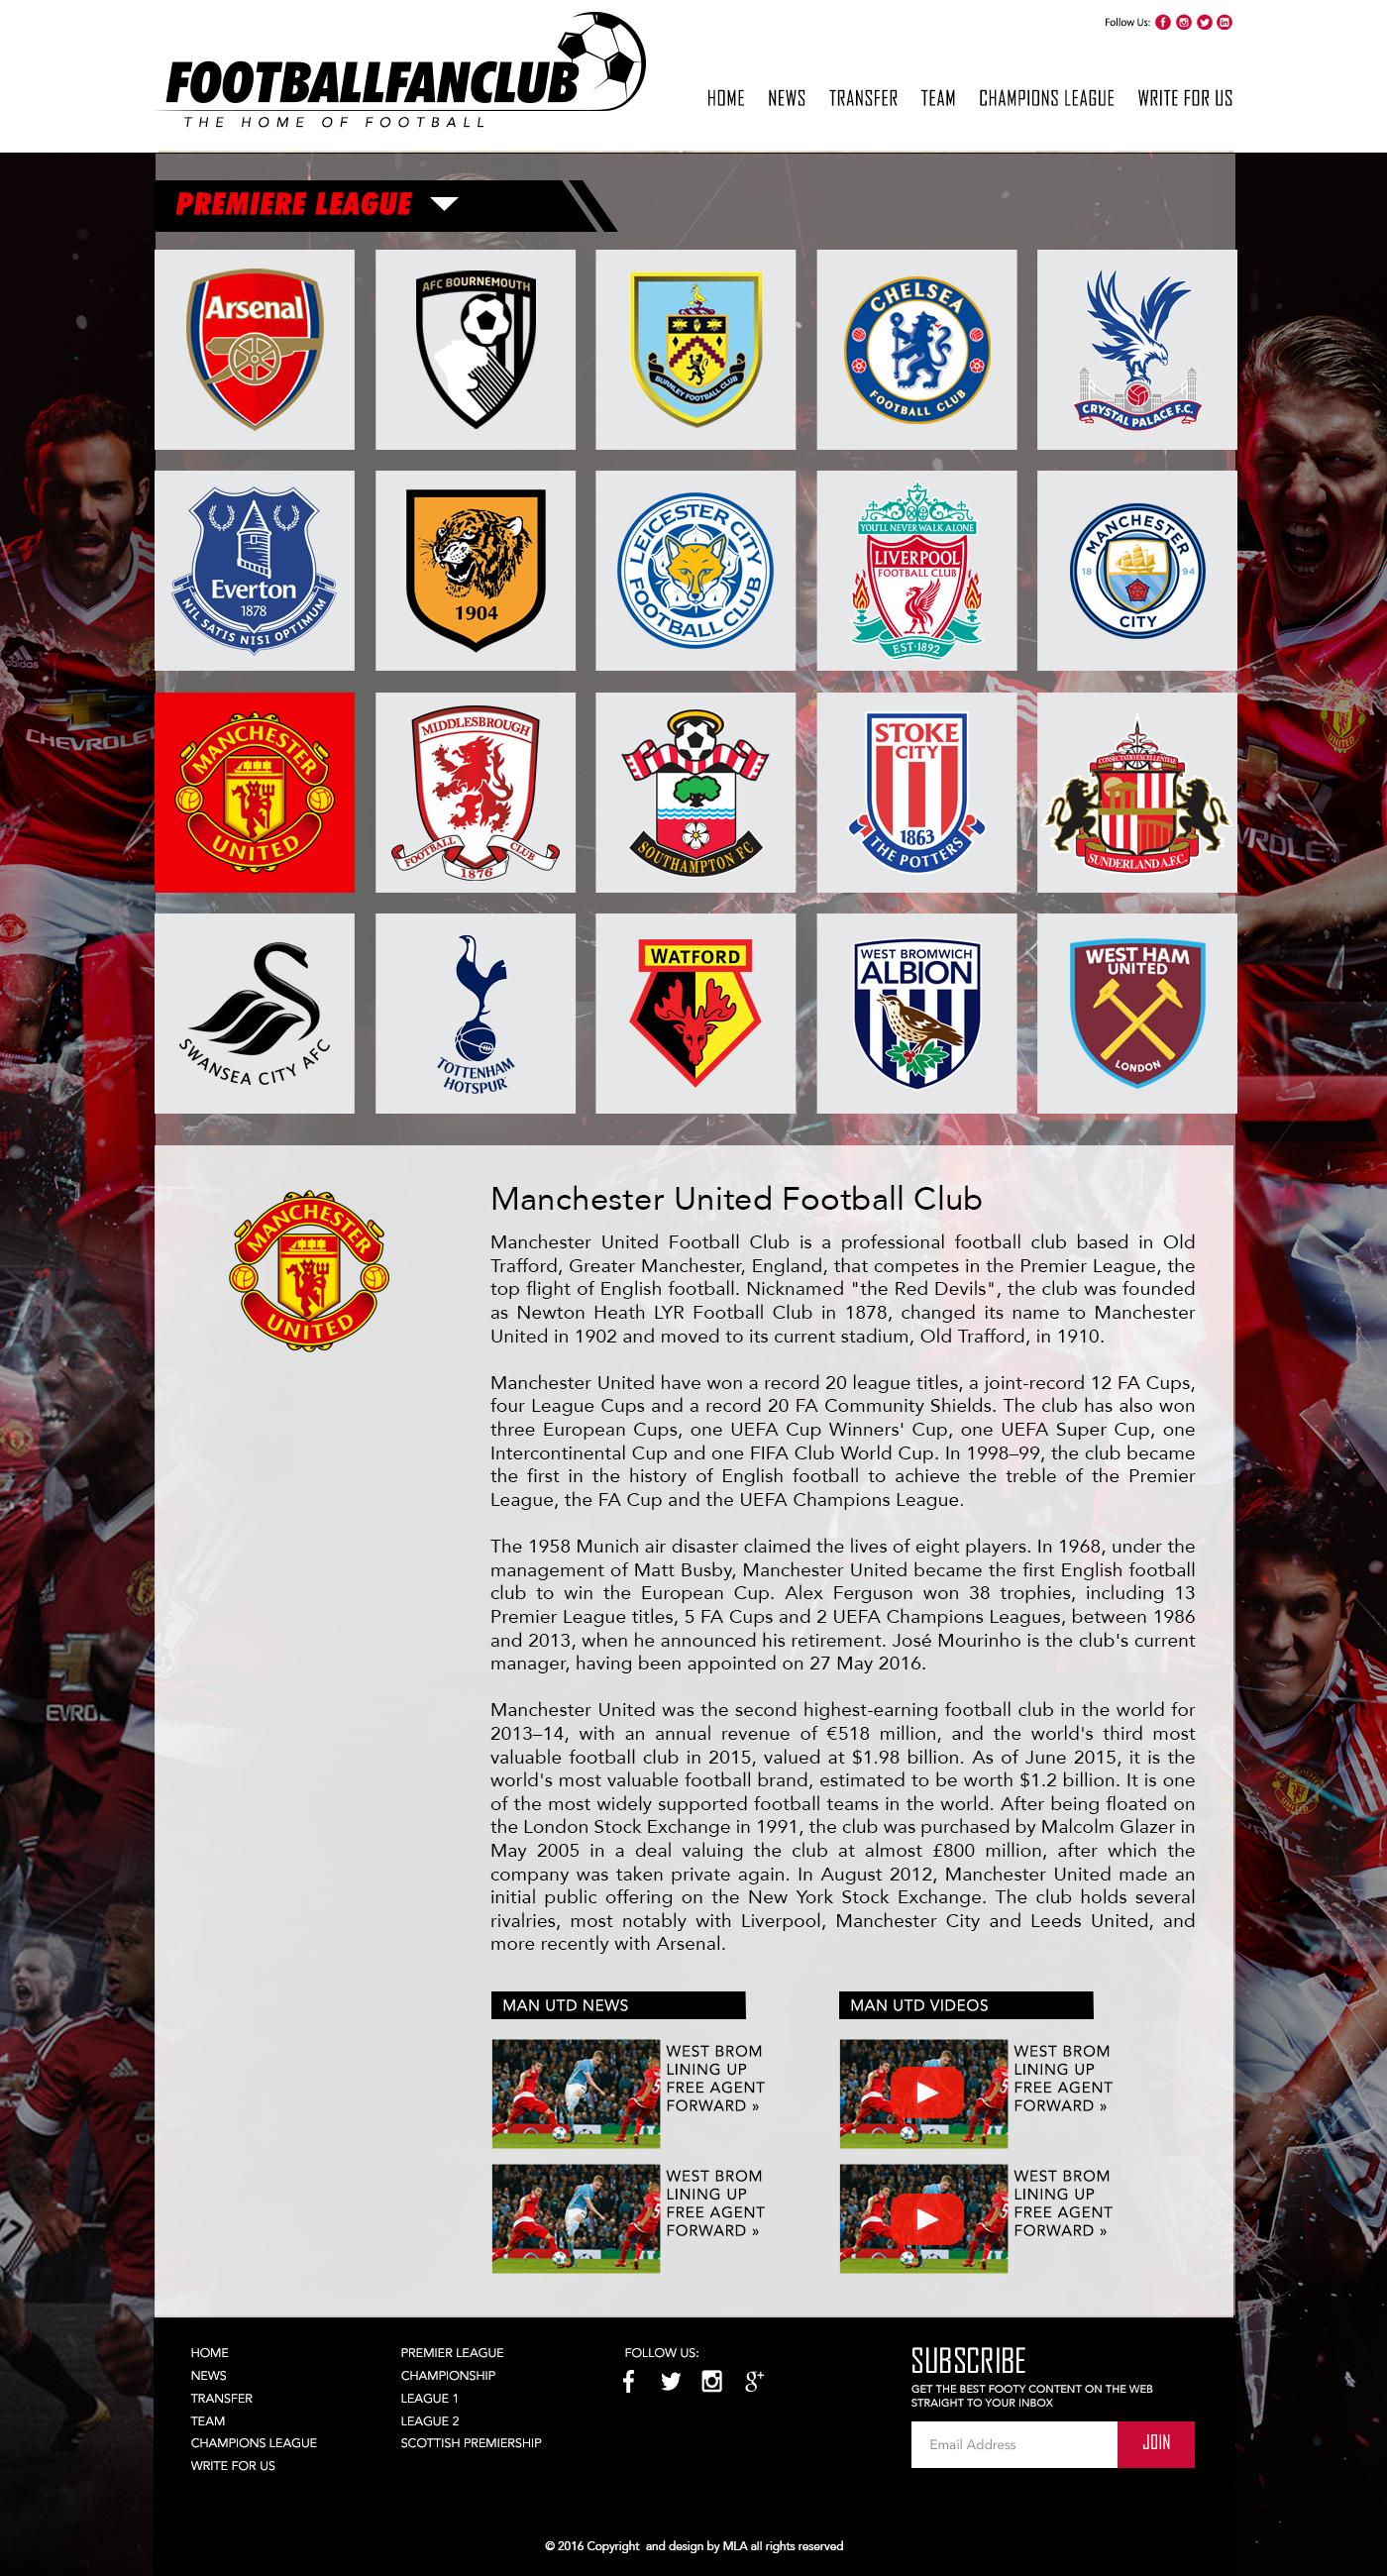 football fanzine team page design